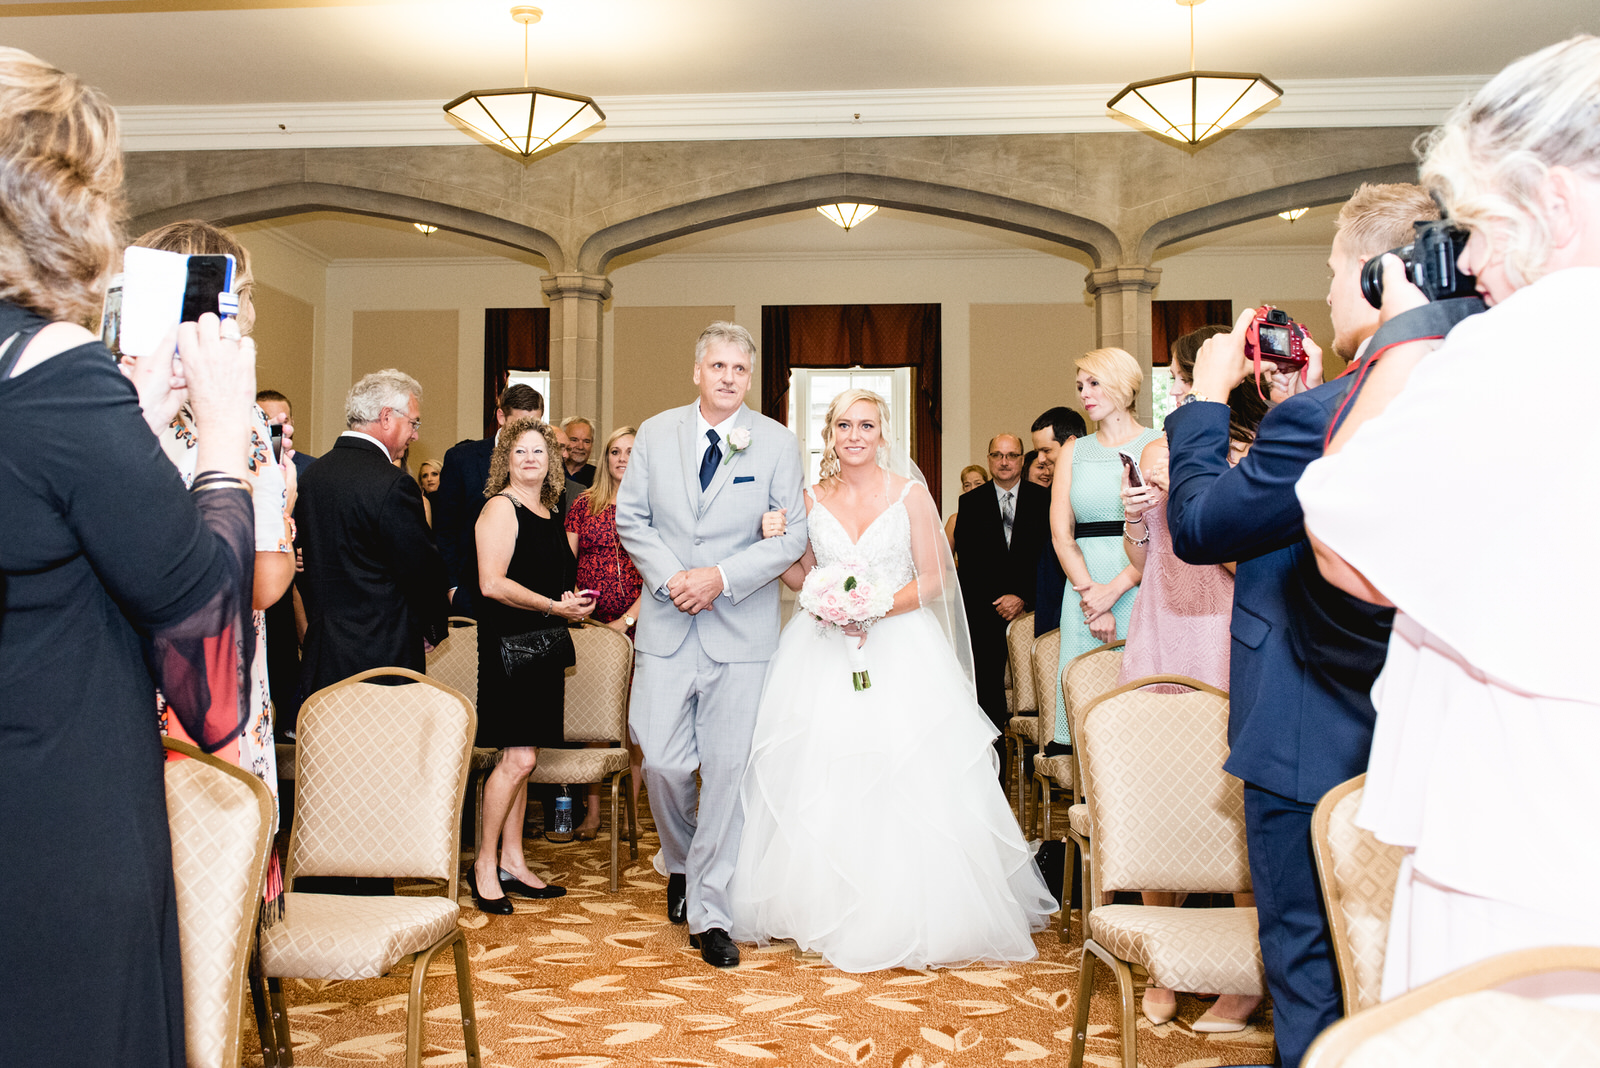 Dad walking bride down isle